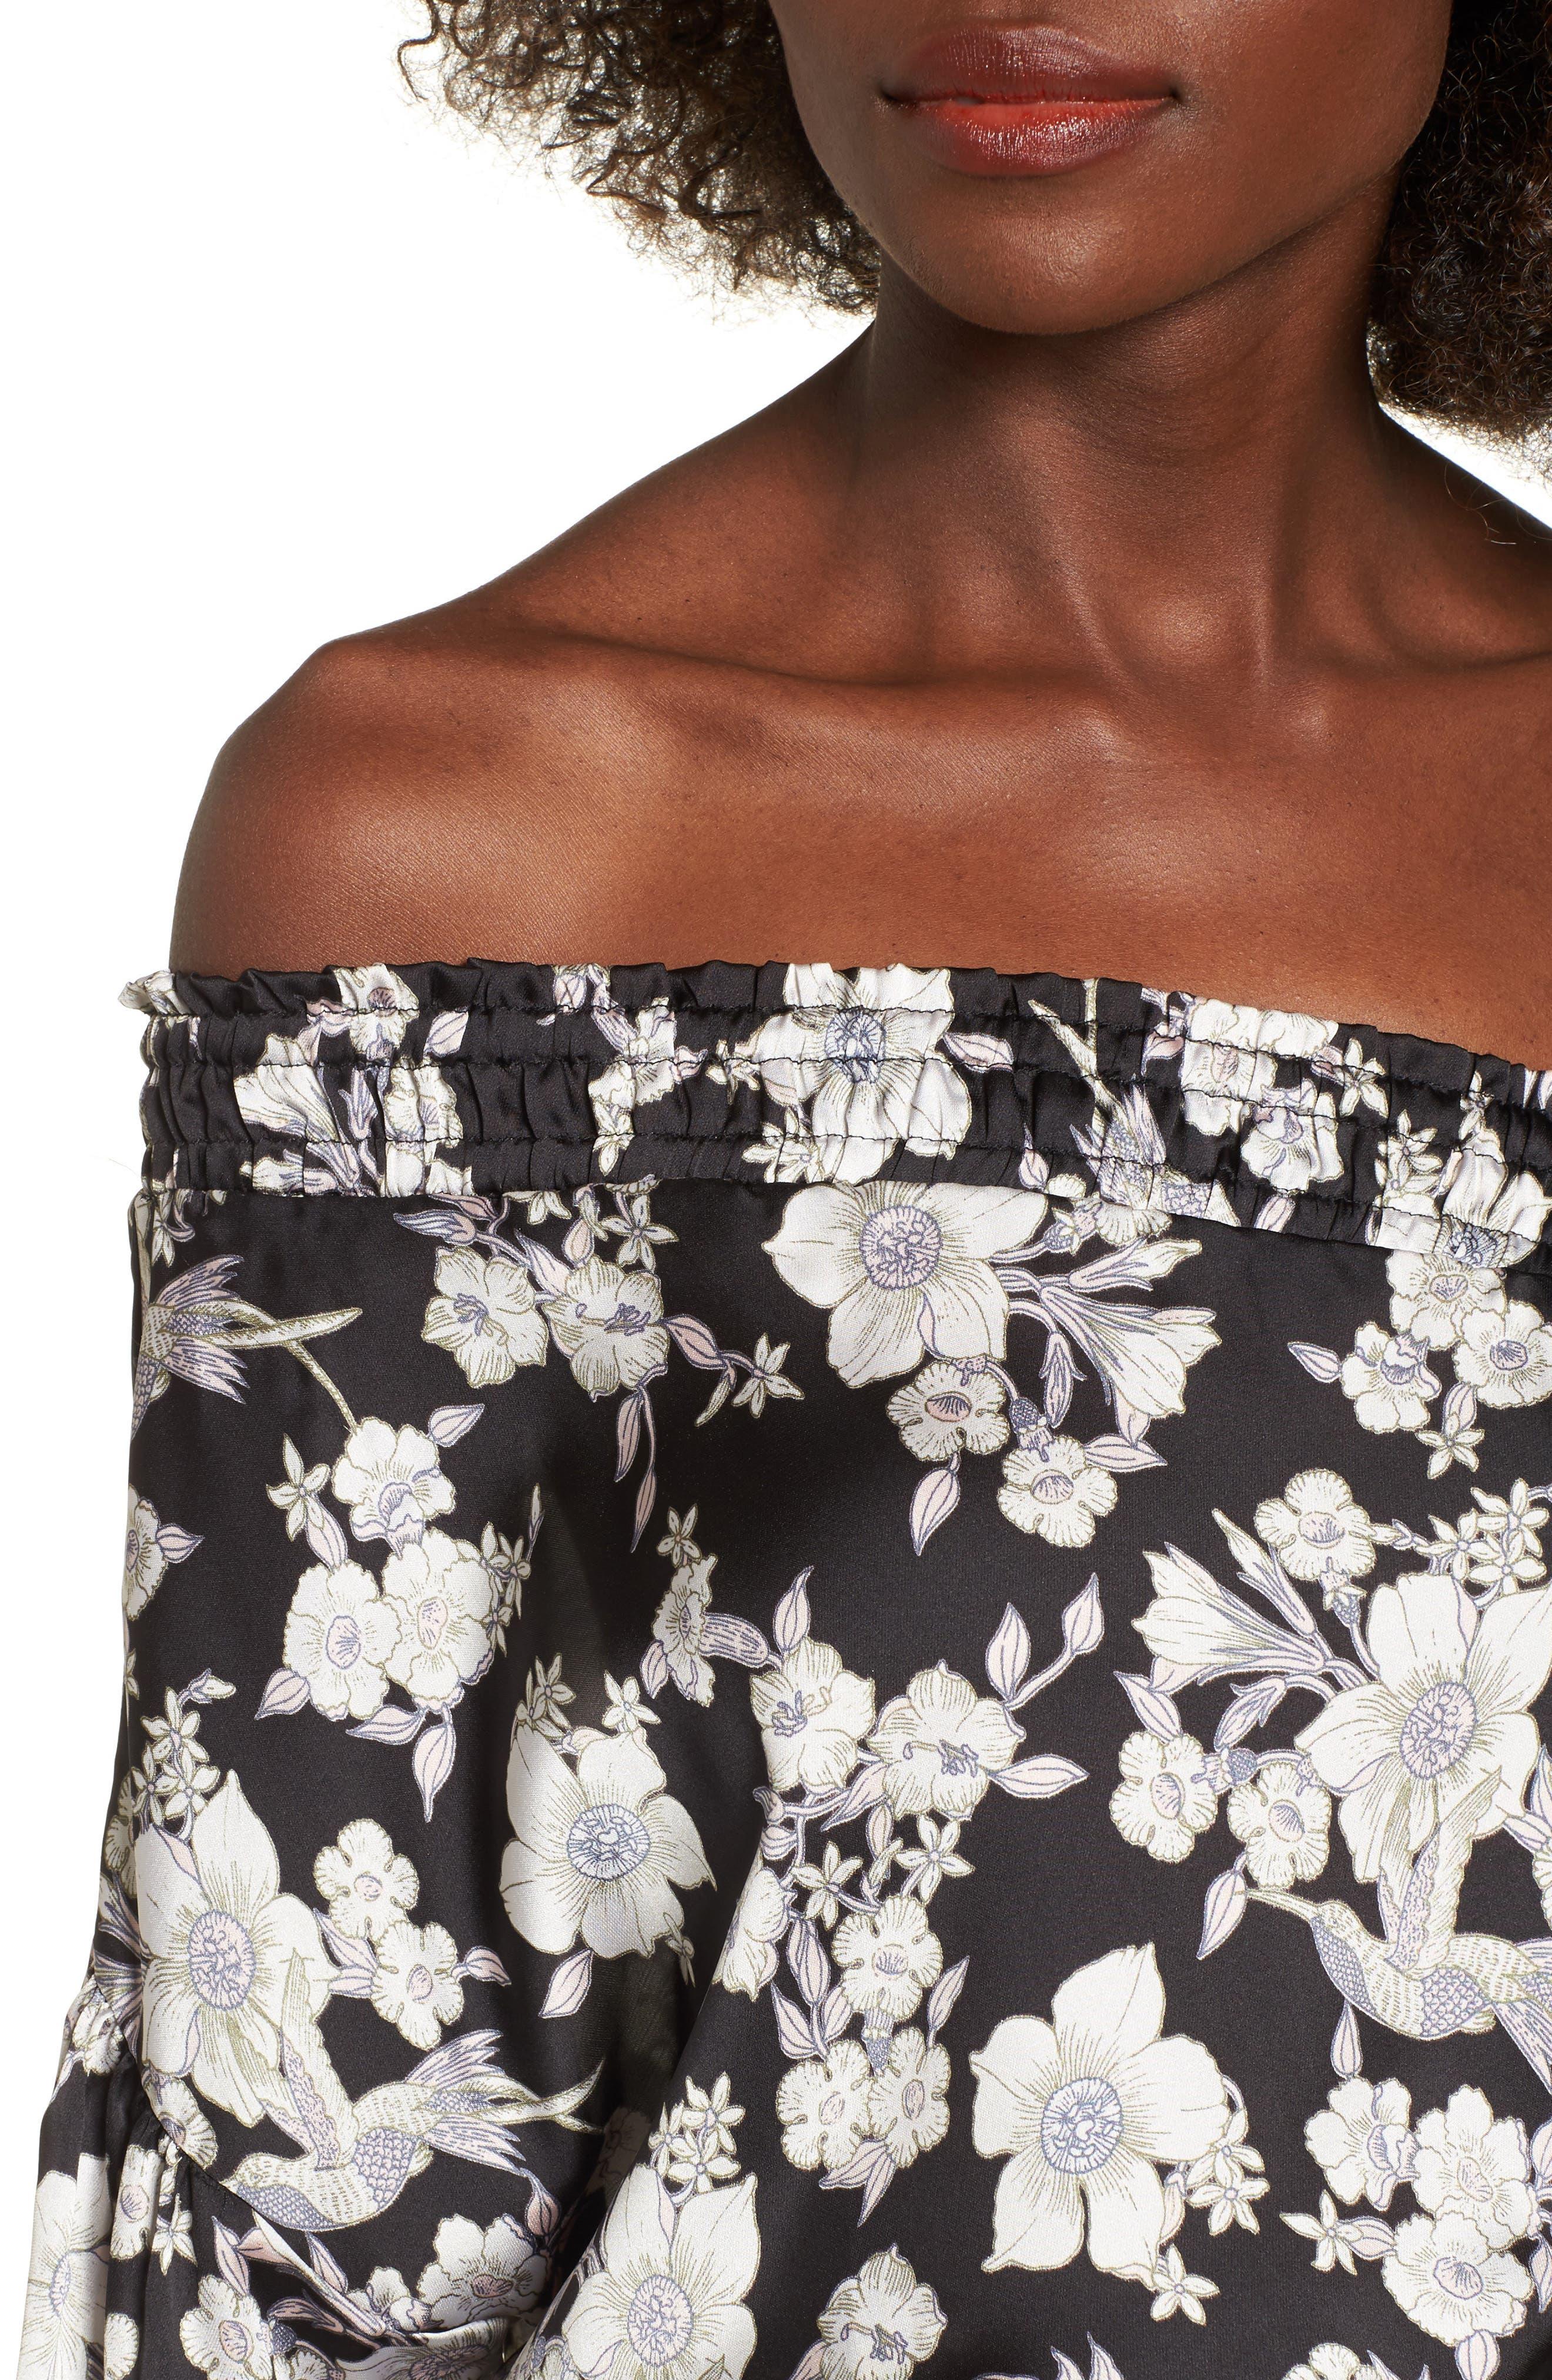 Birdee One Shoulder Crop Top,                             Alternate thumbnail 4, color,                             Black Floral